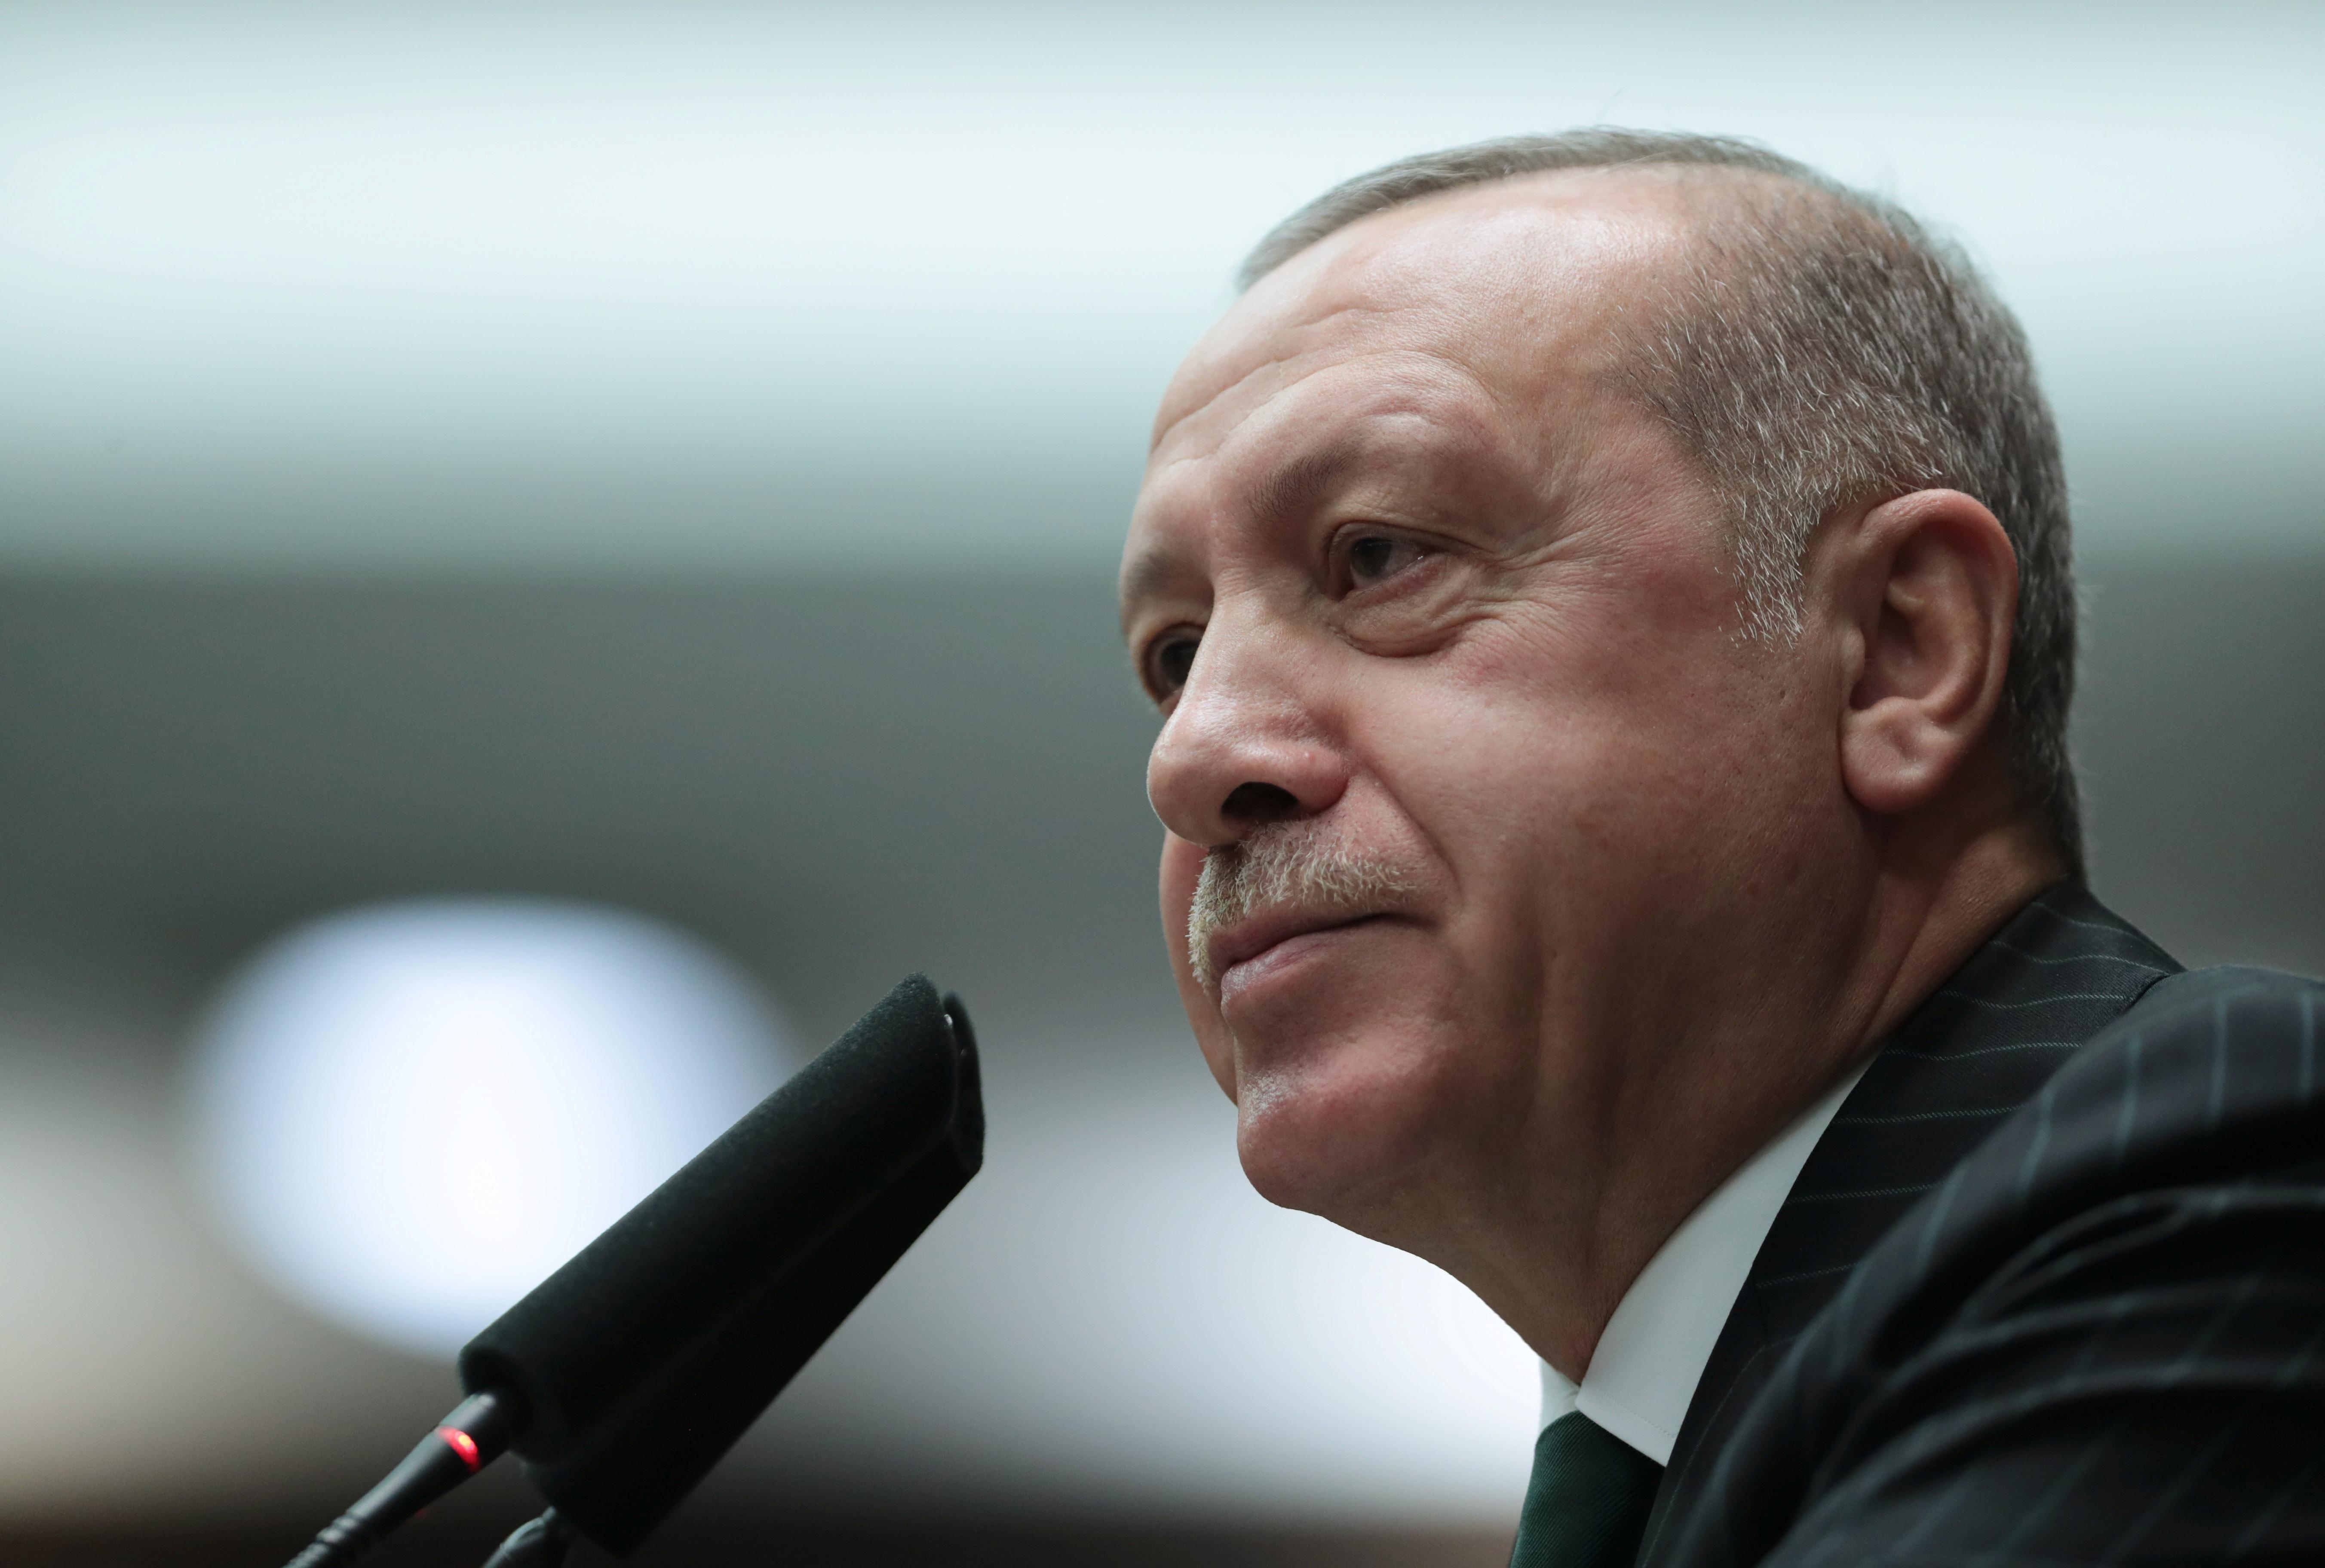 Erdogan ya Uturuki inaita Urusi, Ukraine kutatua matatizo kupitia mazungumzo